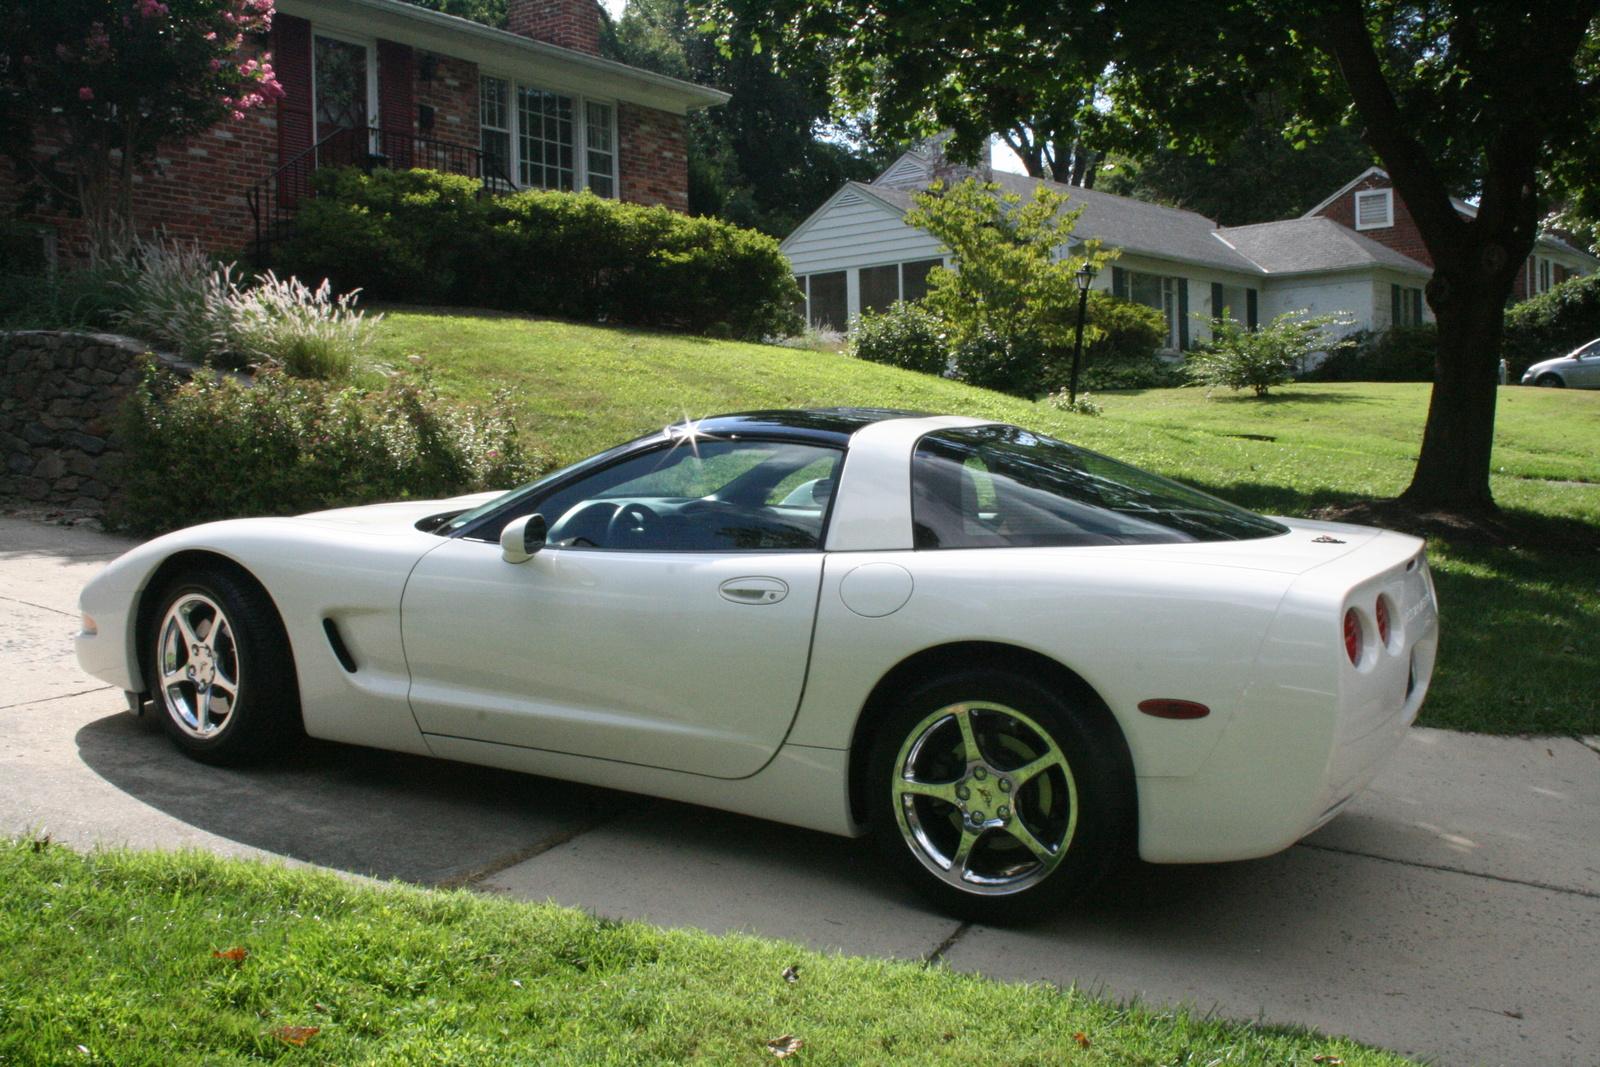 Used Chevrolet Corvette For Sale Baltimore, MD - CarGurus